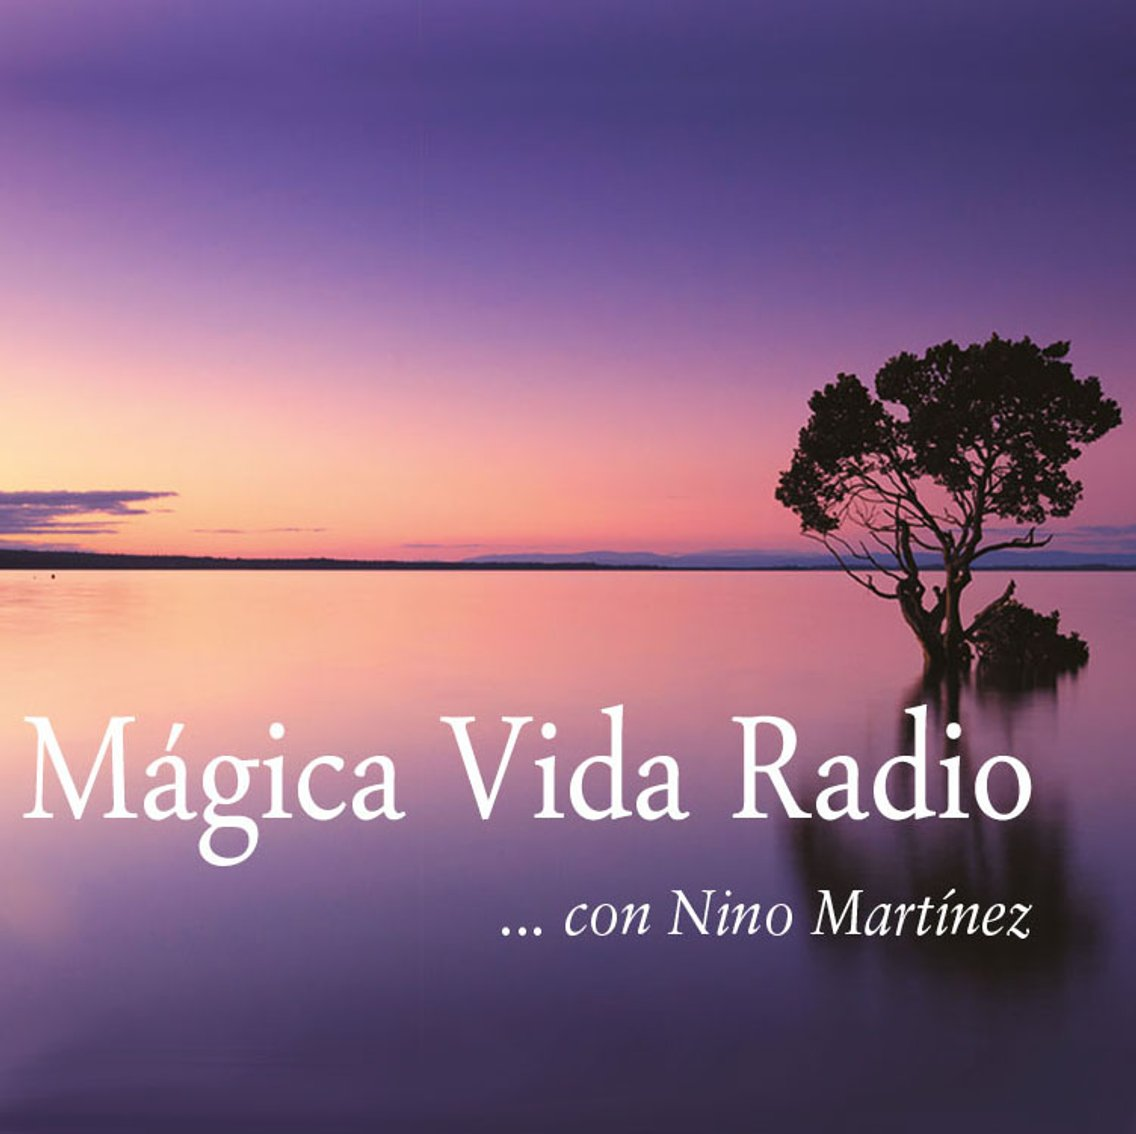 Mágica Vida Radio - Cover Image